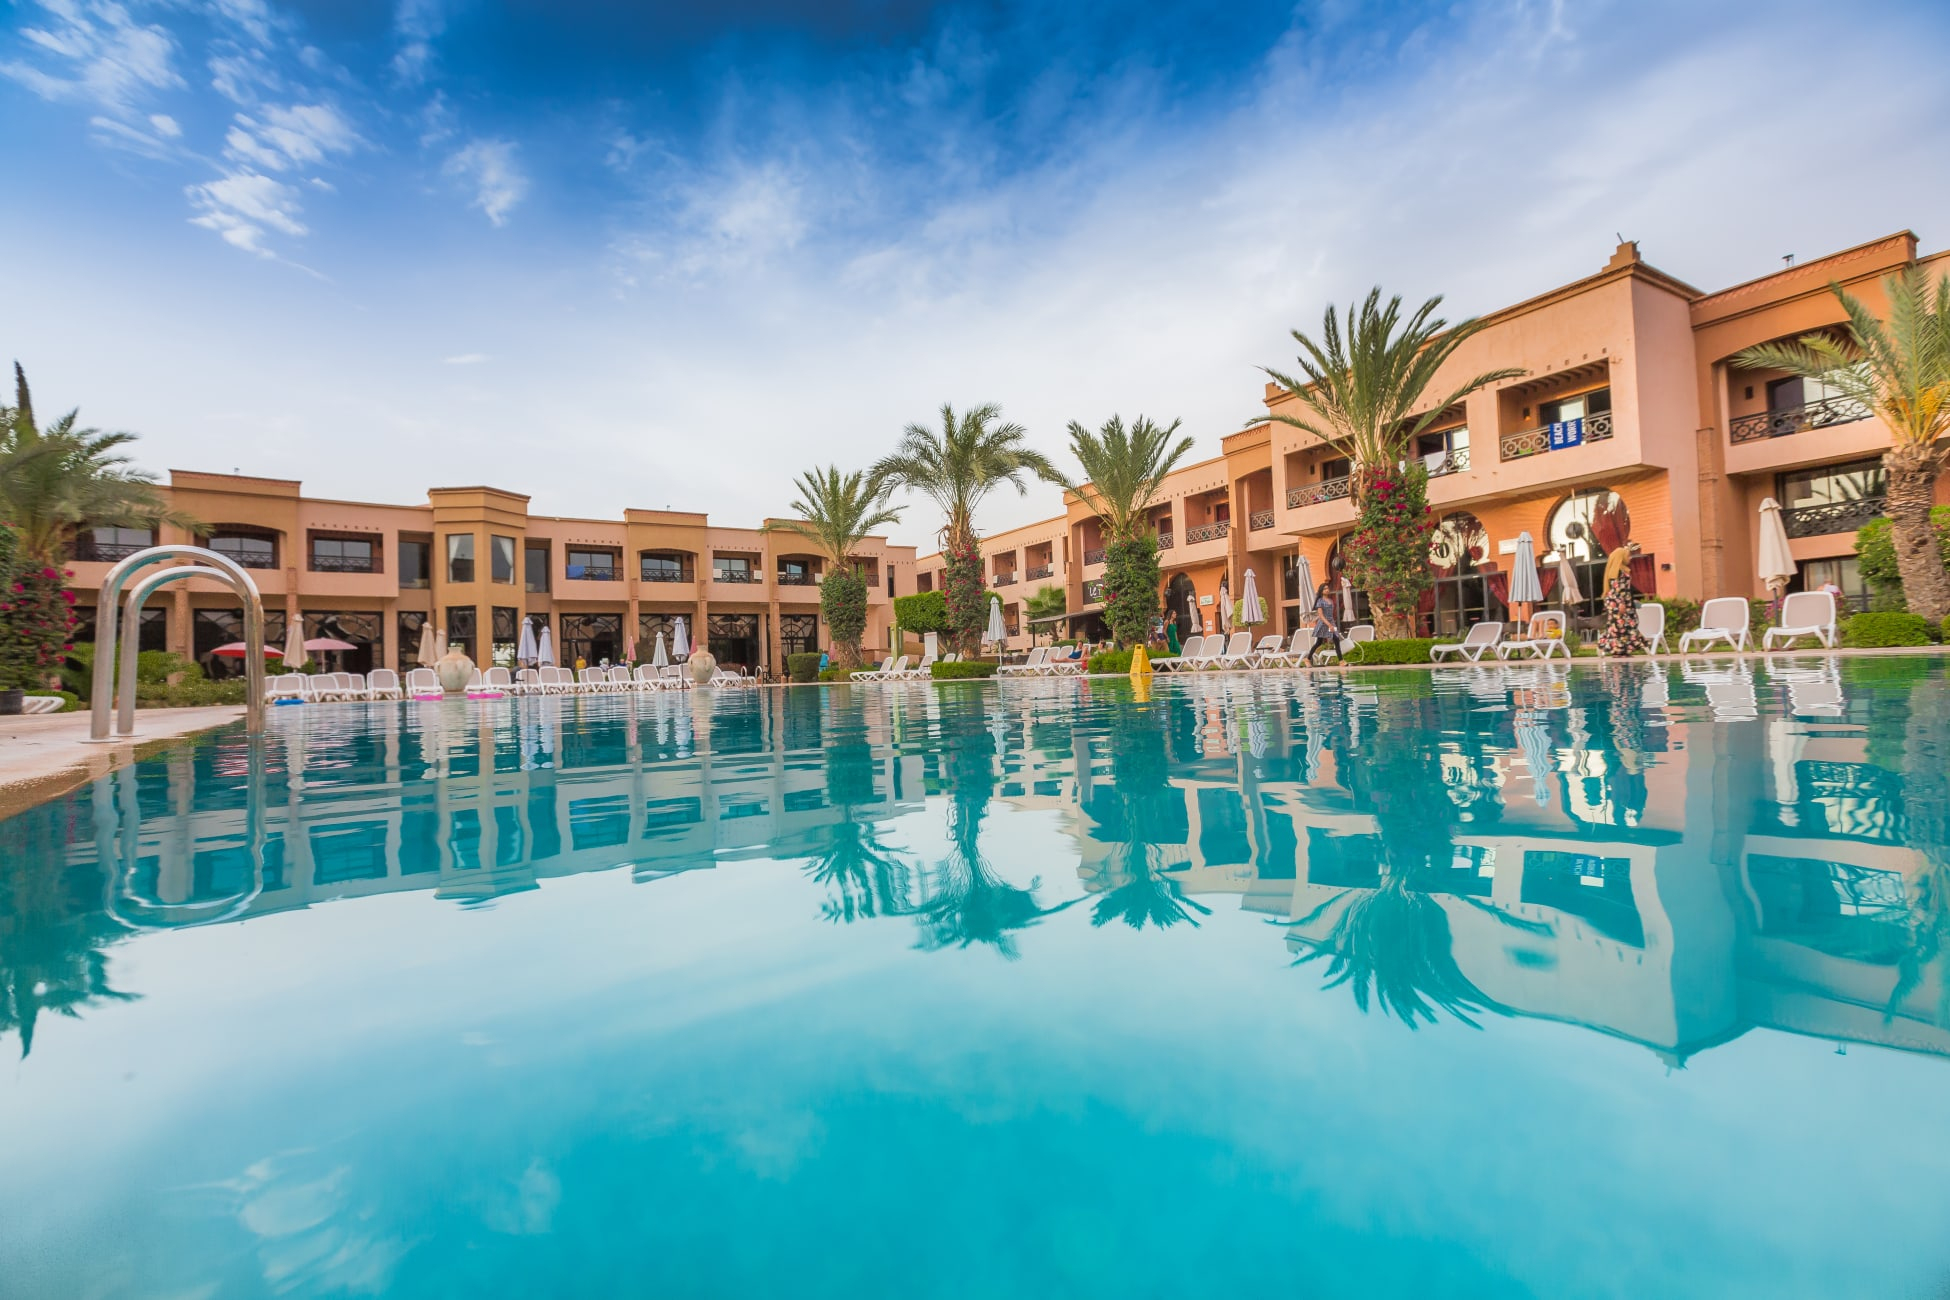 Otel - Marakeş   Club Paradisio - Trivago.tr encequiconcerne Les Jardins De L Agdal Hotel & Spa